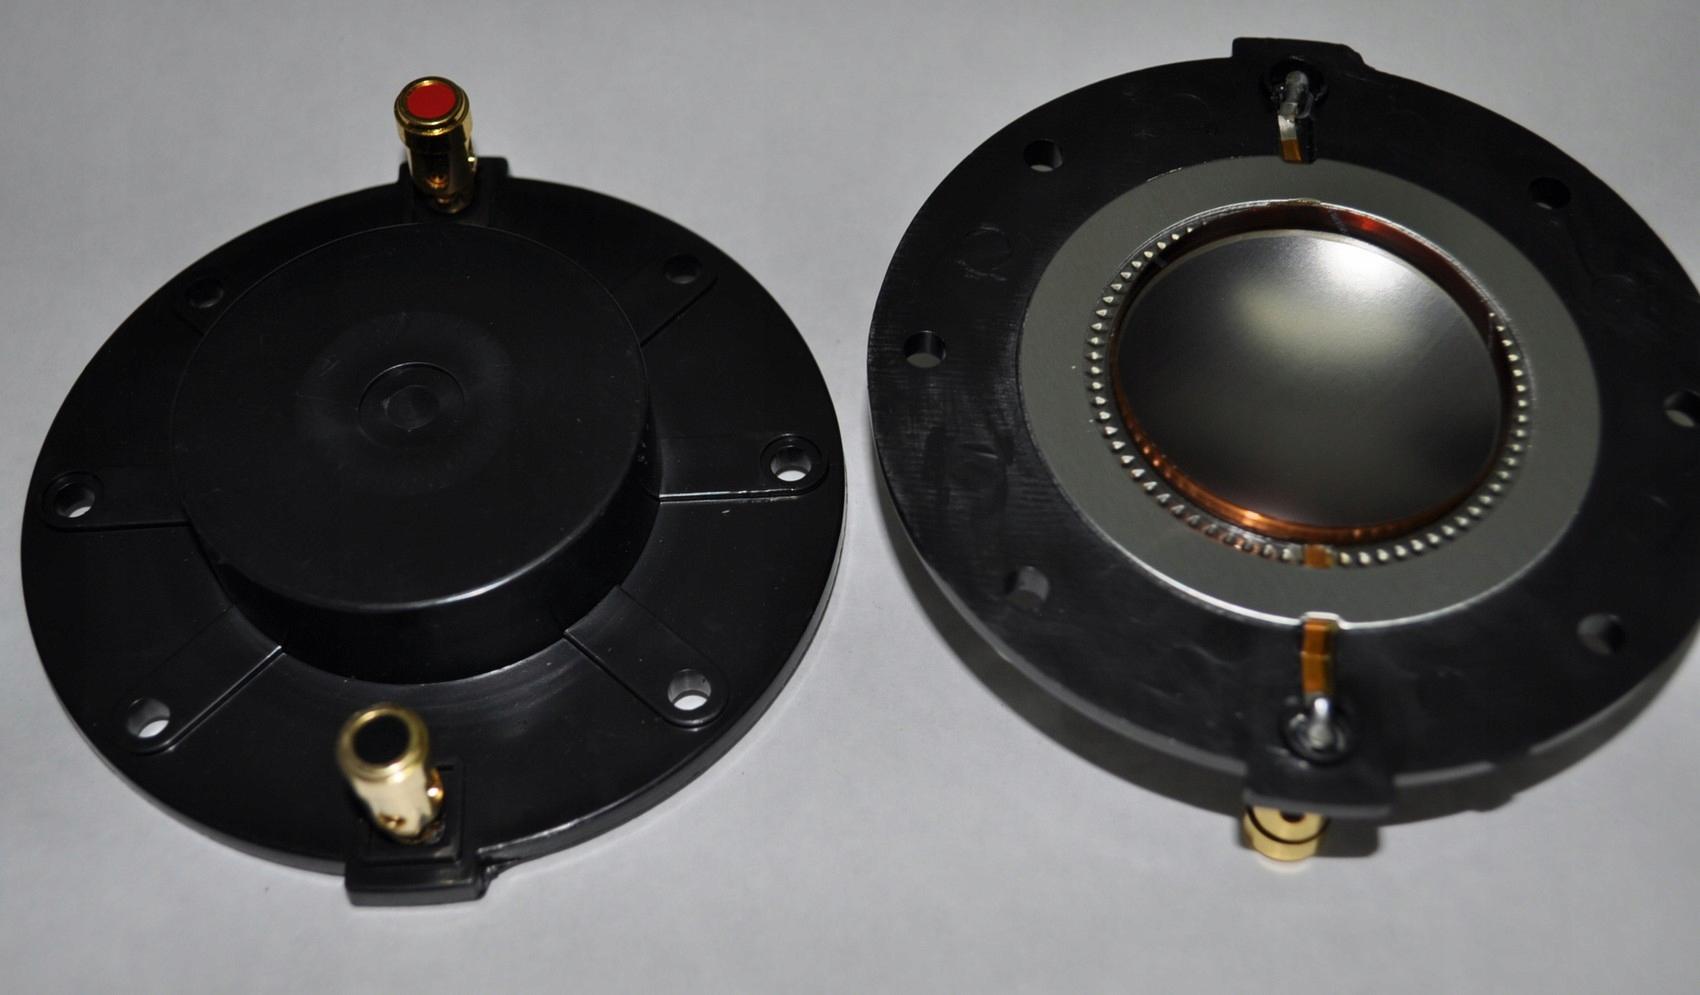 Cievka Dome pre vodiča VK-400 B7, Cervin 44.4mm